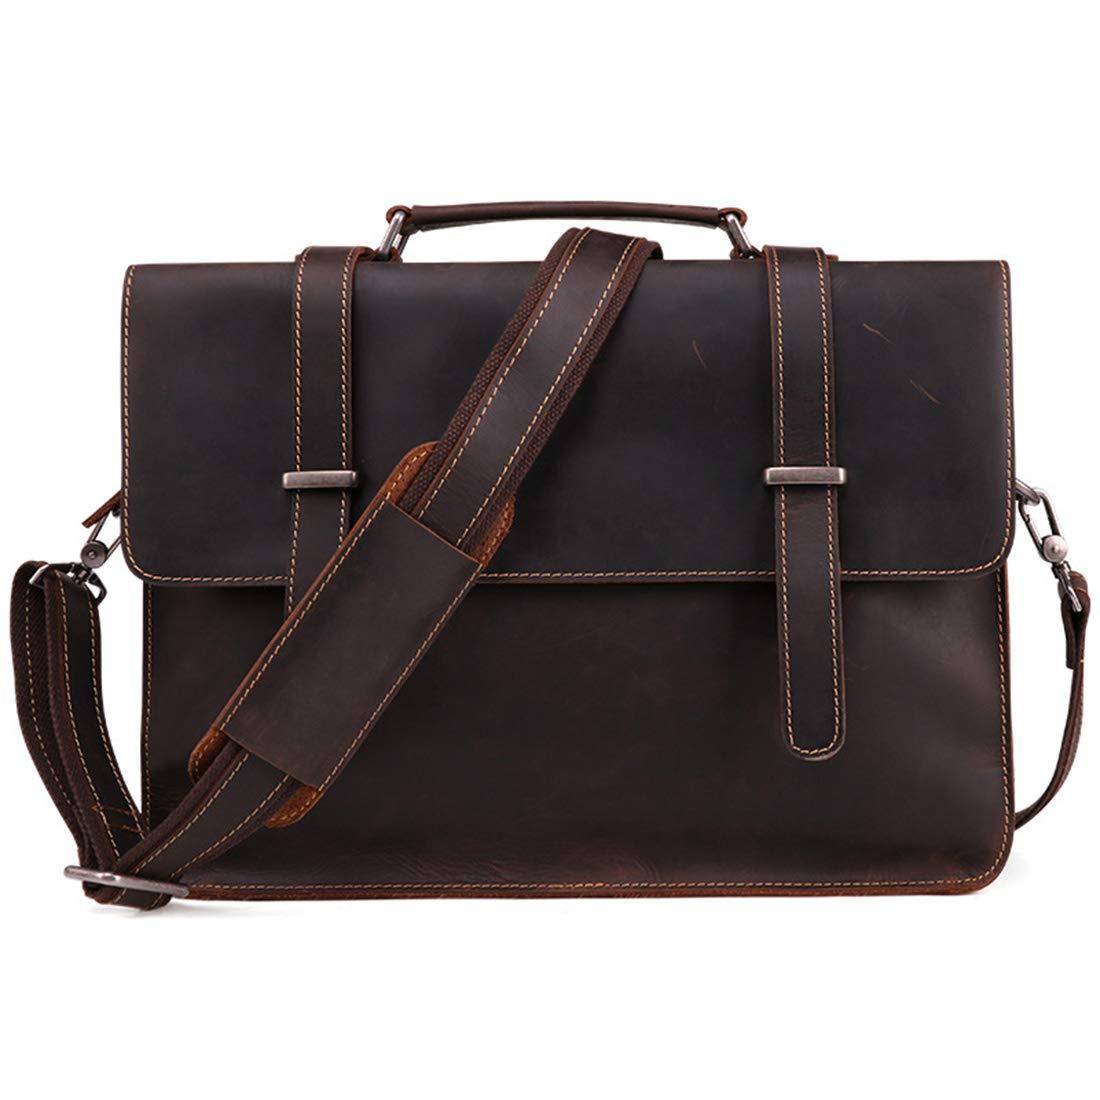 KRPENRIO Mens Office Business Briefcase Tote Bag Shoulder Casual Travel Shopping Handbag for 13 Inch Tablet Color : Dark Coffee